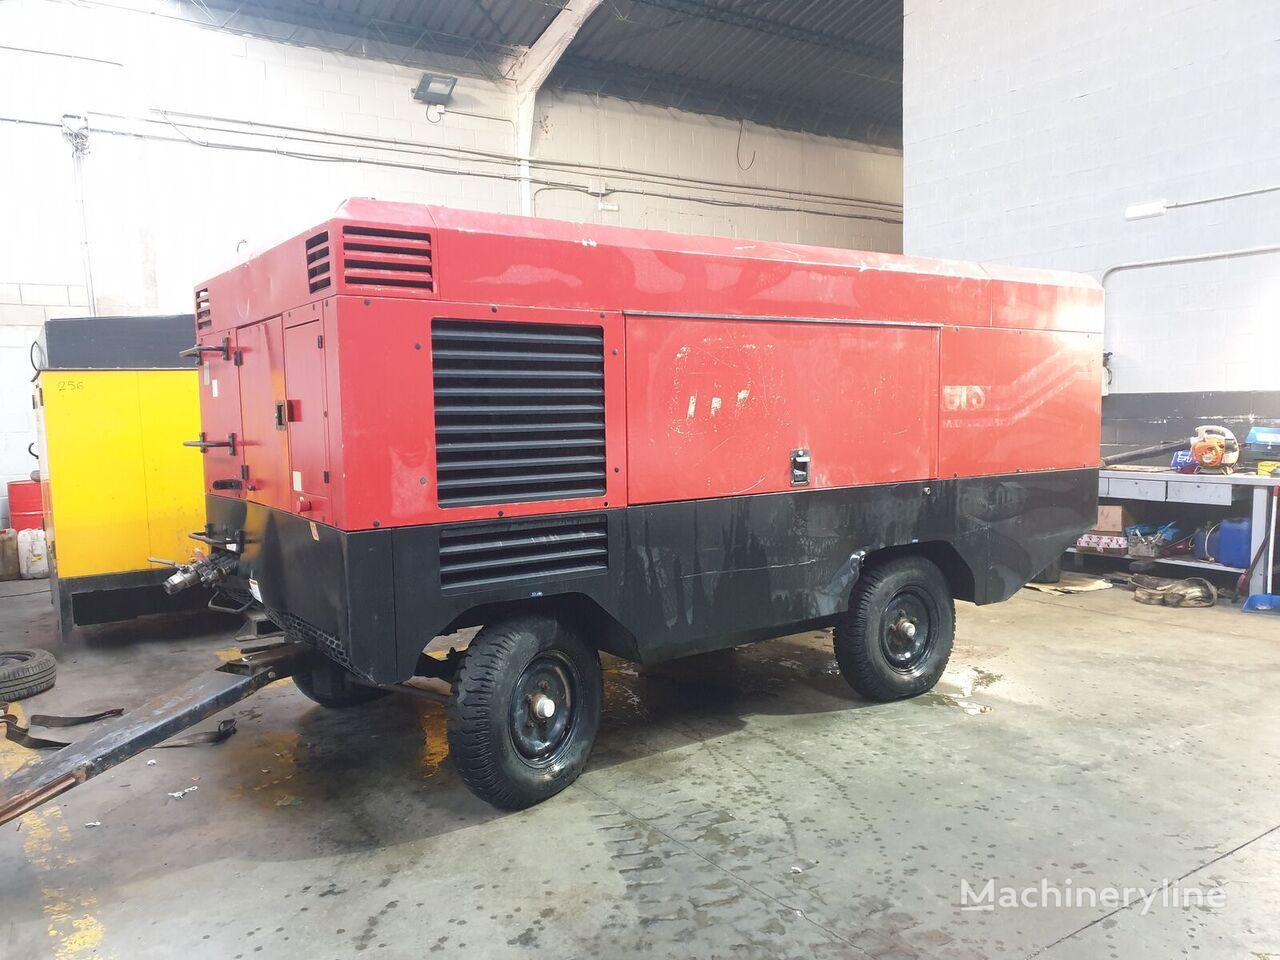 INGERSOLL RAND 21/215 compressor